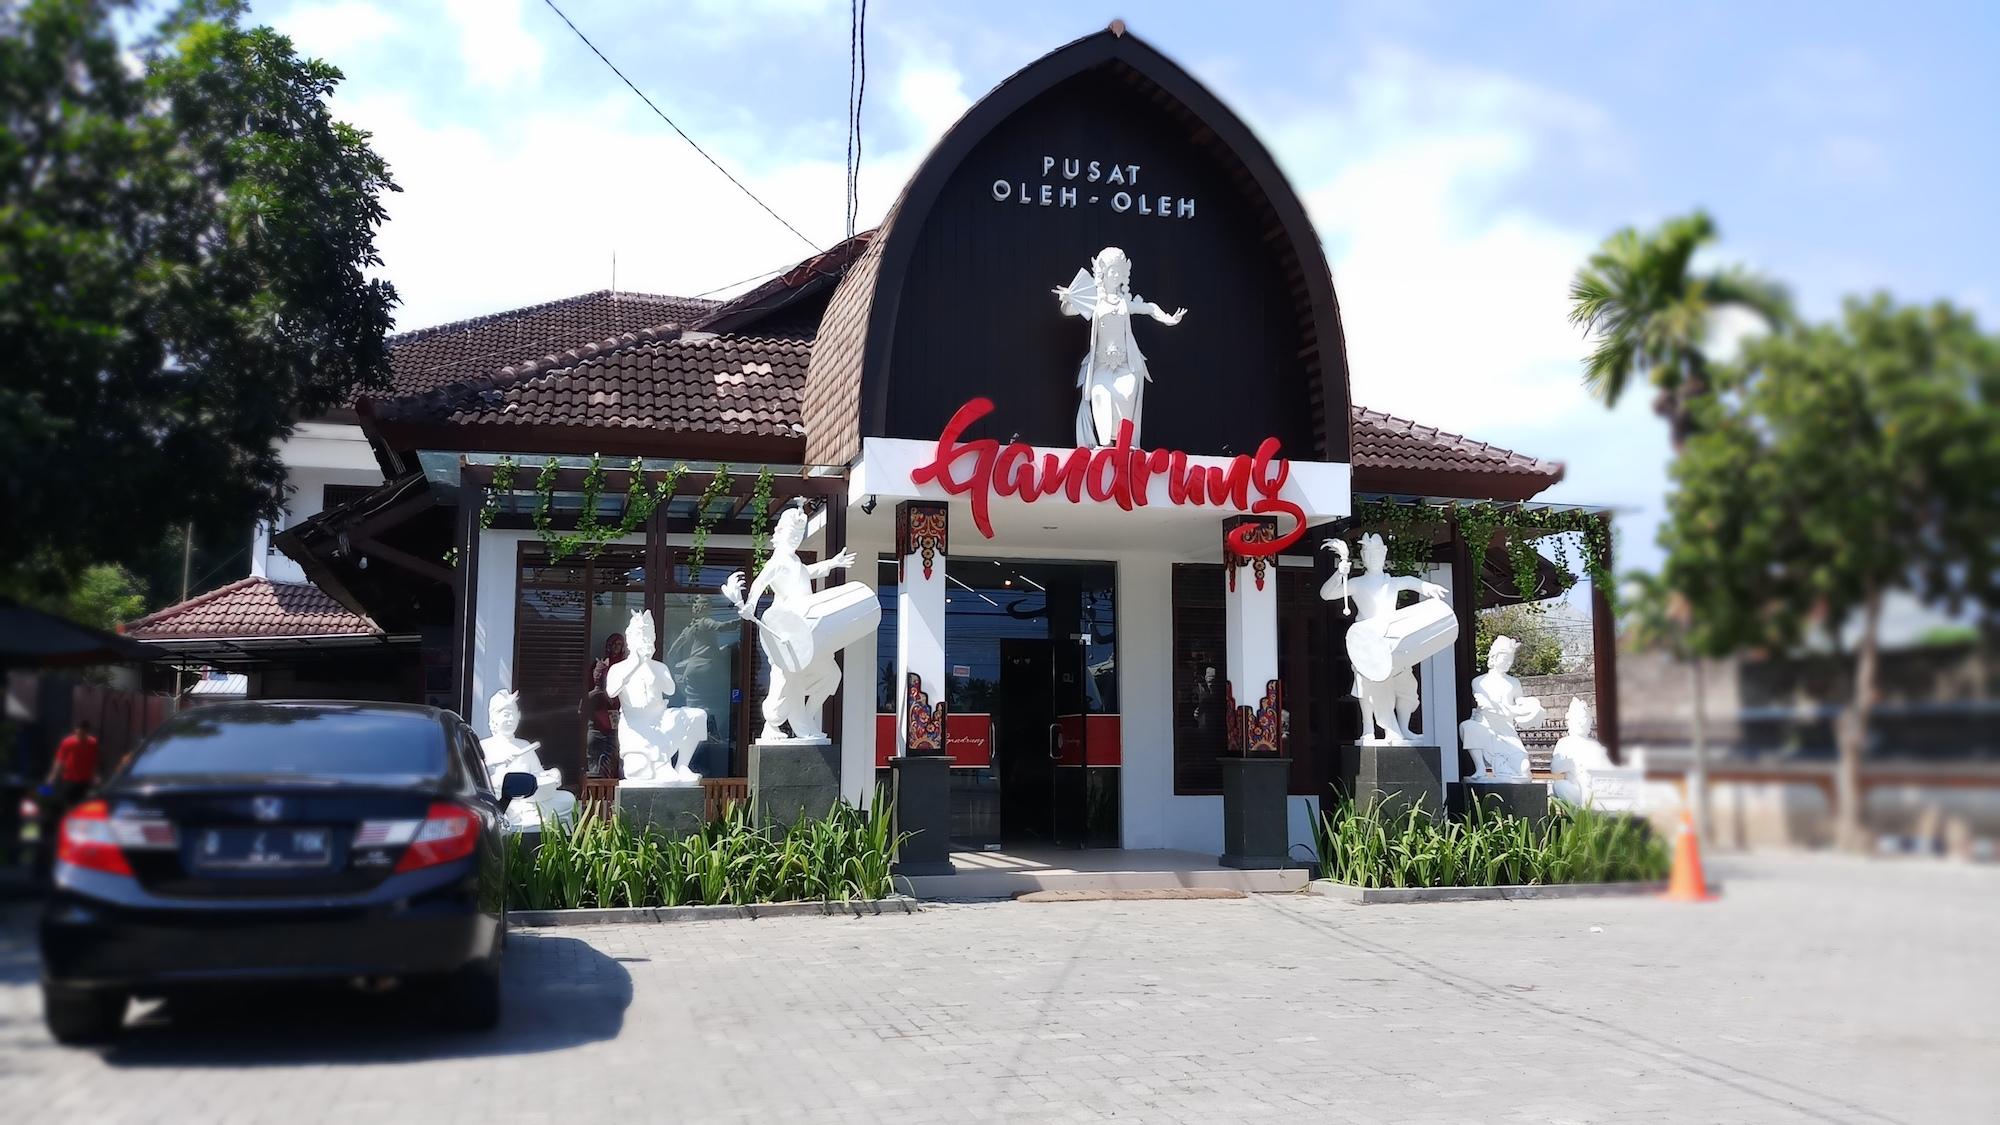 Jalan-Jalan ke Lombok, Tempat Asik Belanja Oleh-Olehnya ya di Toko Gandrung